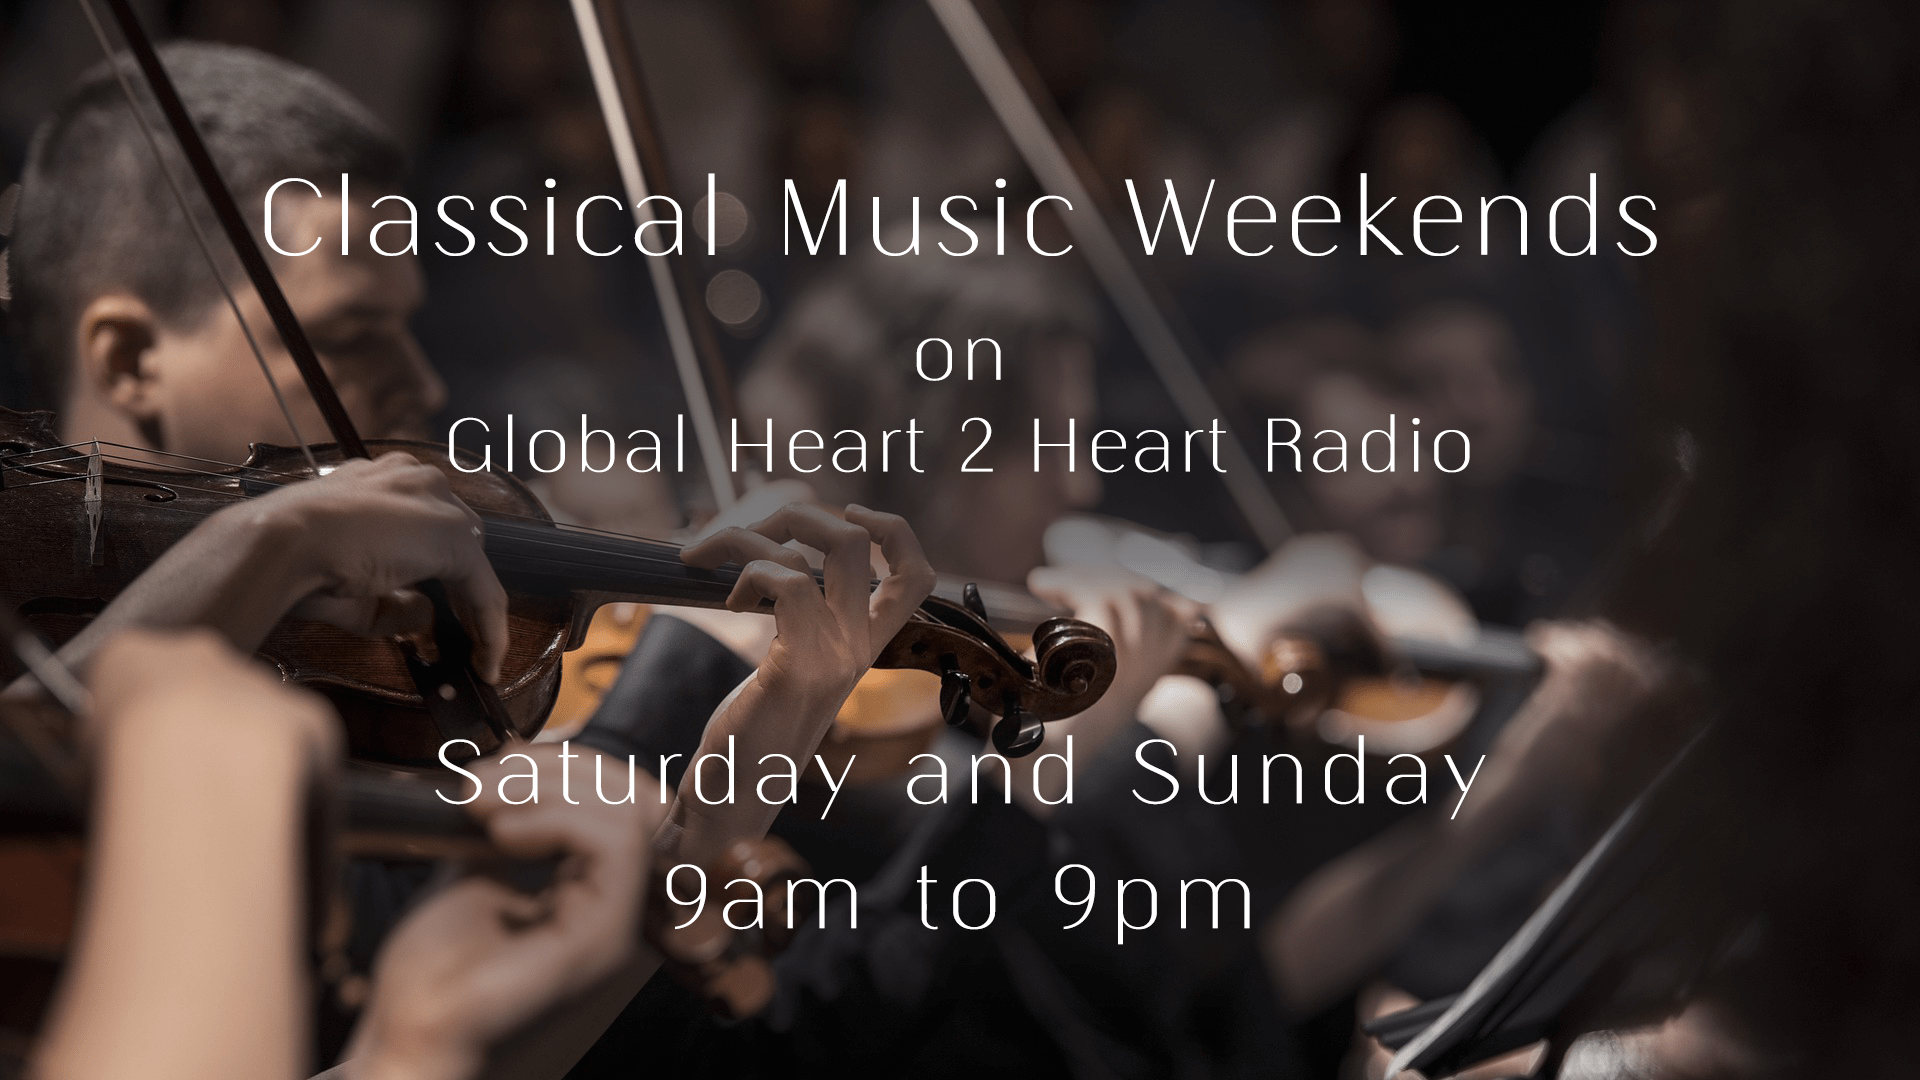 Classical Music Weekends on Global Heart 2 Heart Radio